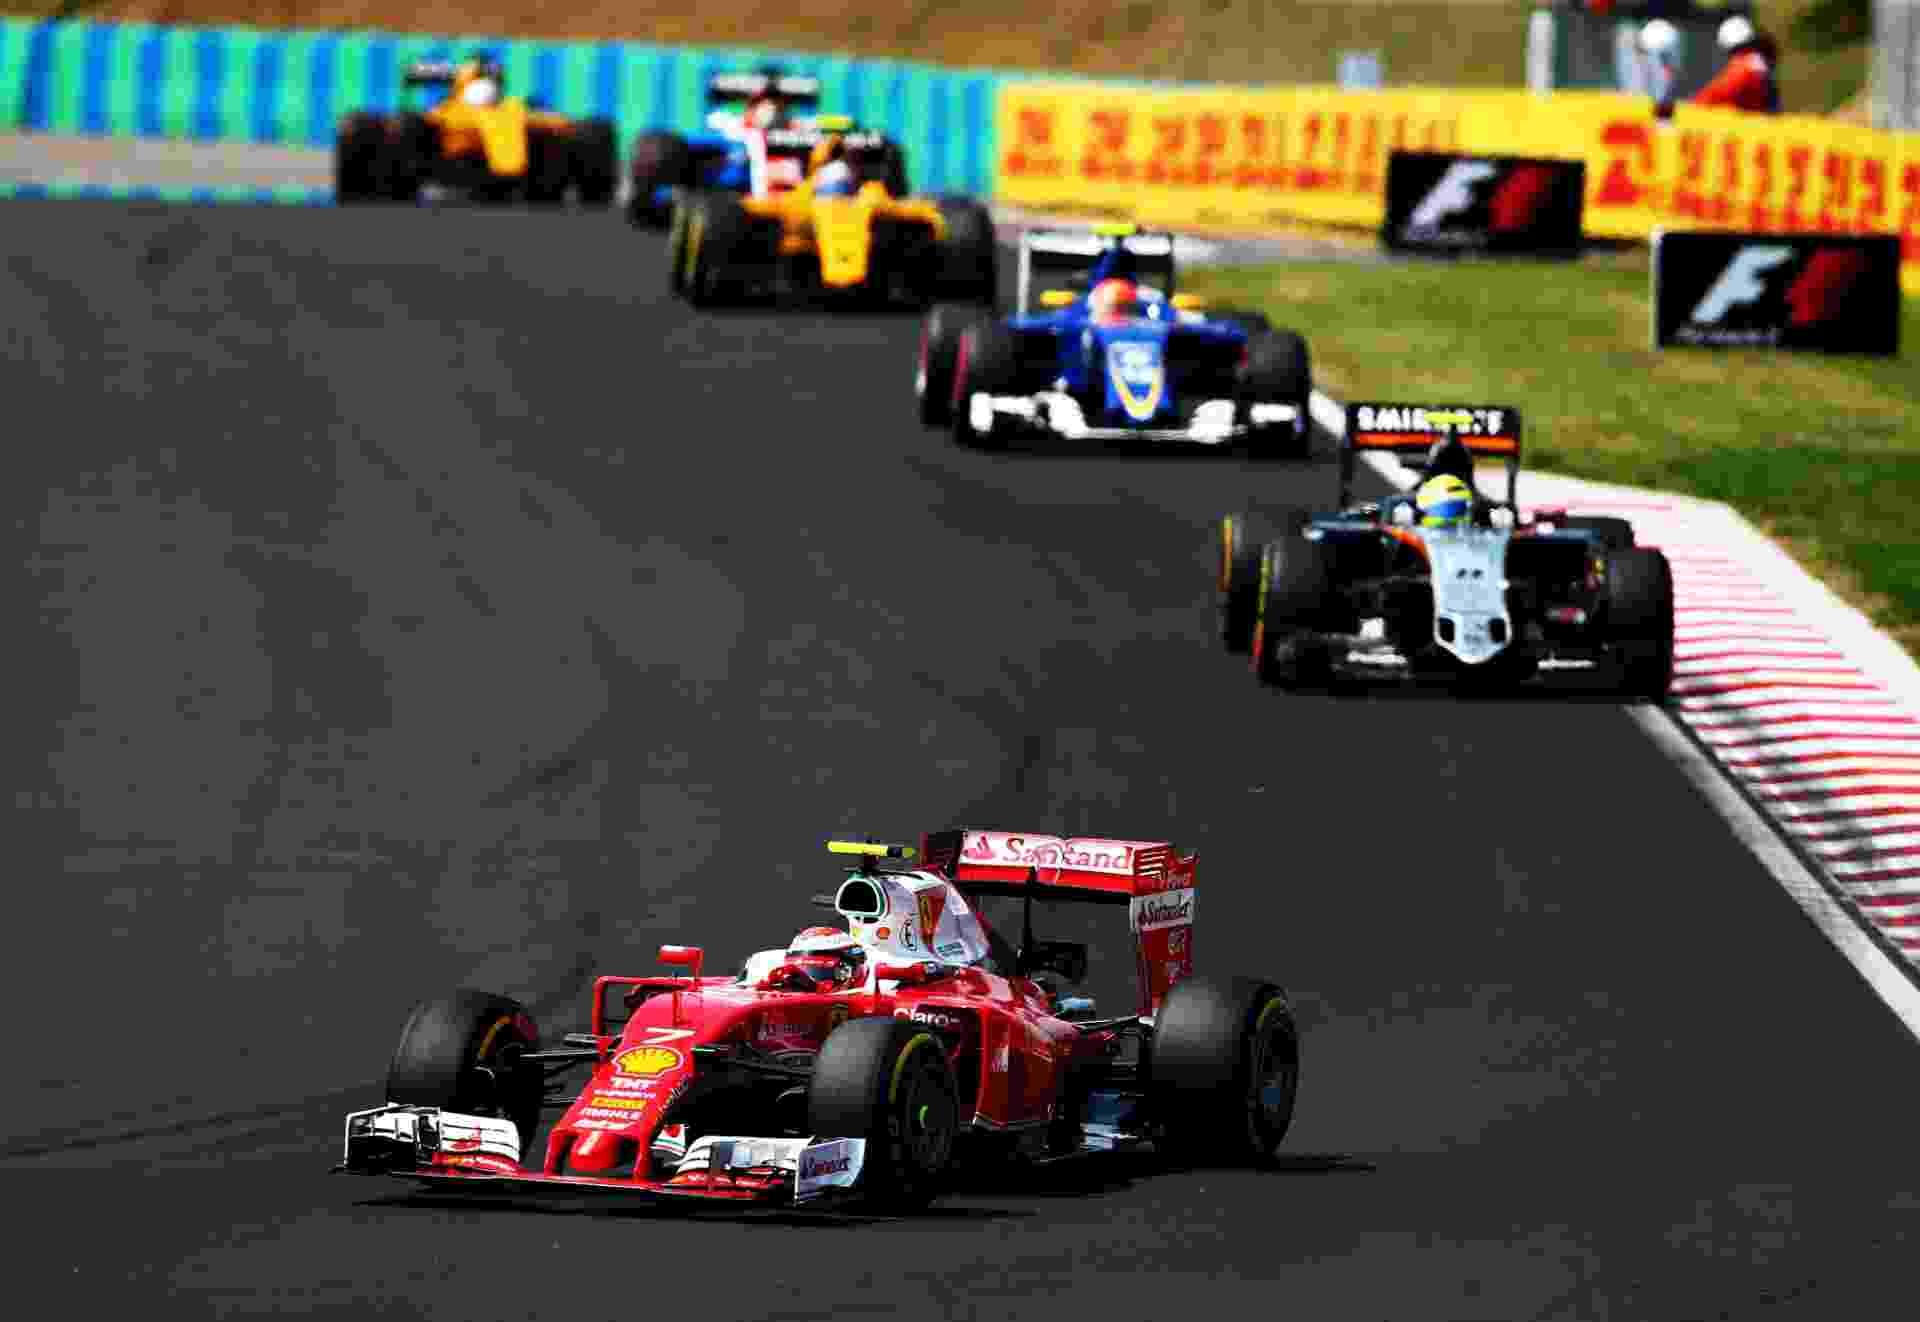 Kimi Raikkonen pilota a Ferrari diante de diversos torcedores finlandeses no GP da Hungria - Dan Istitene/Getty Images